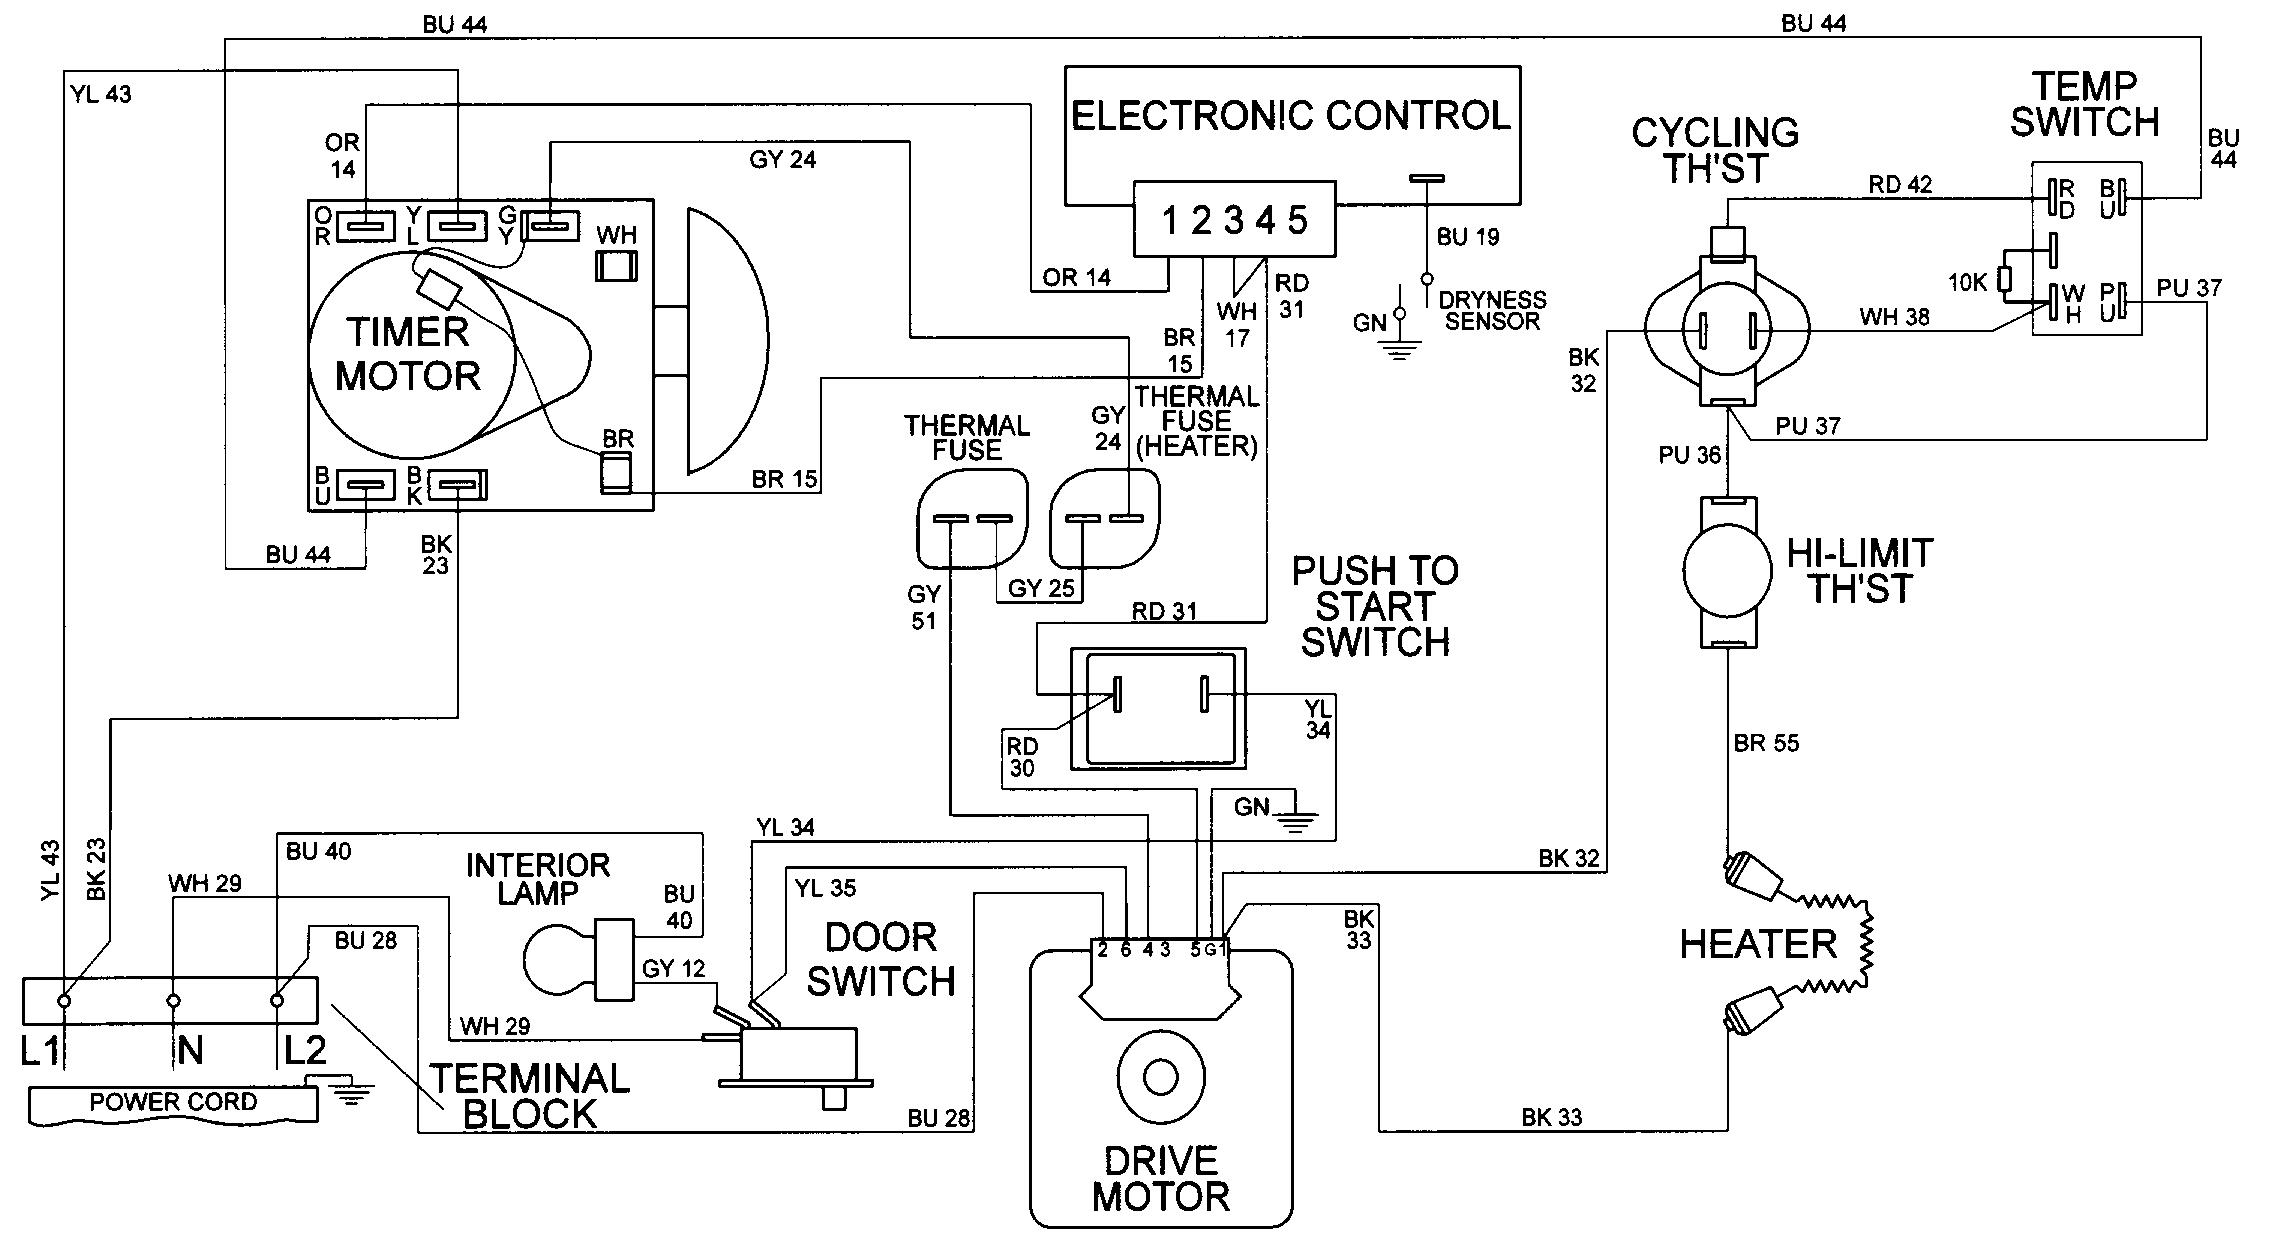 maytag mde9606azw wiring information diagram [ 2287 x 1248 Pixel ]